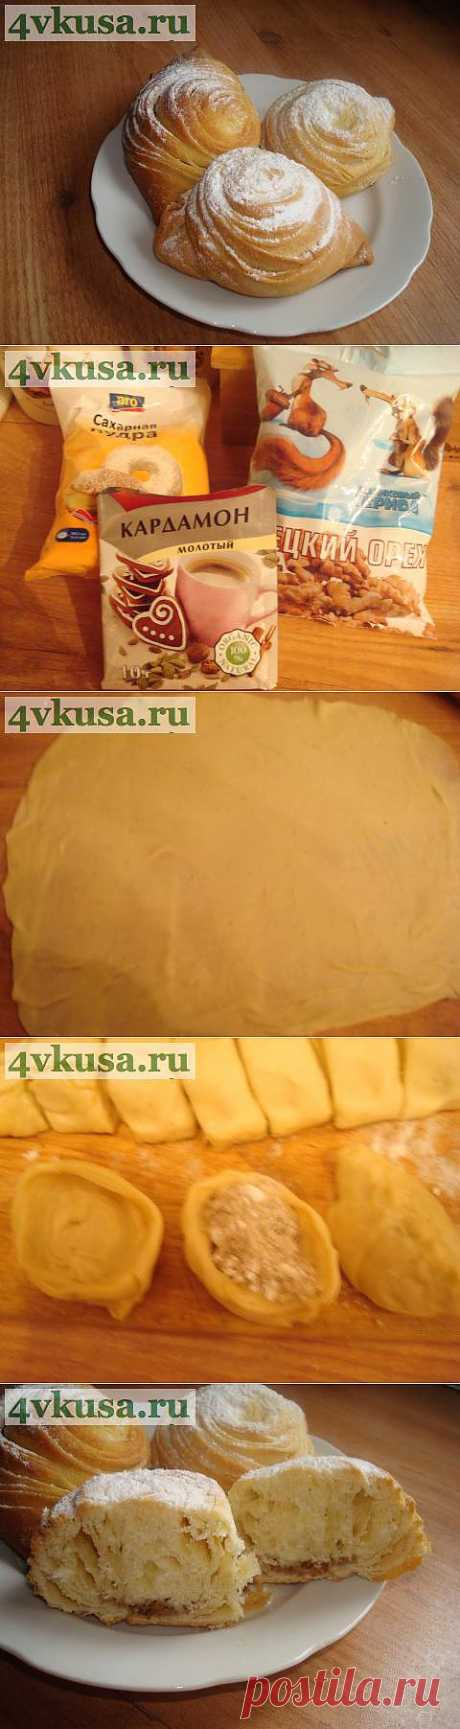 БАДАМБУРА | 4vkusa.ru